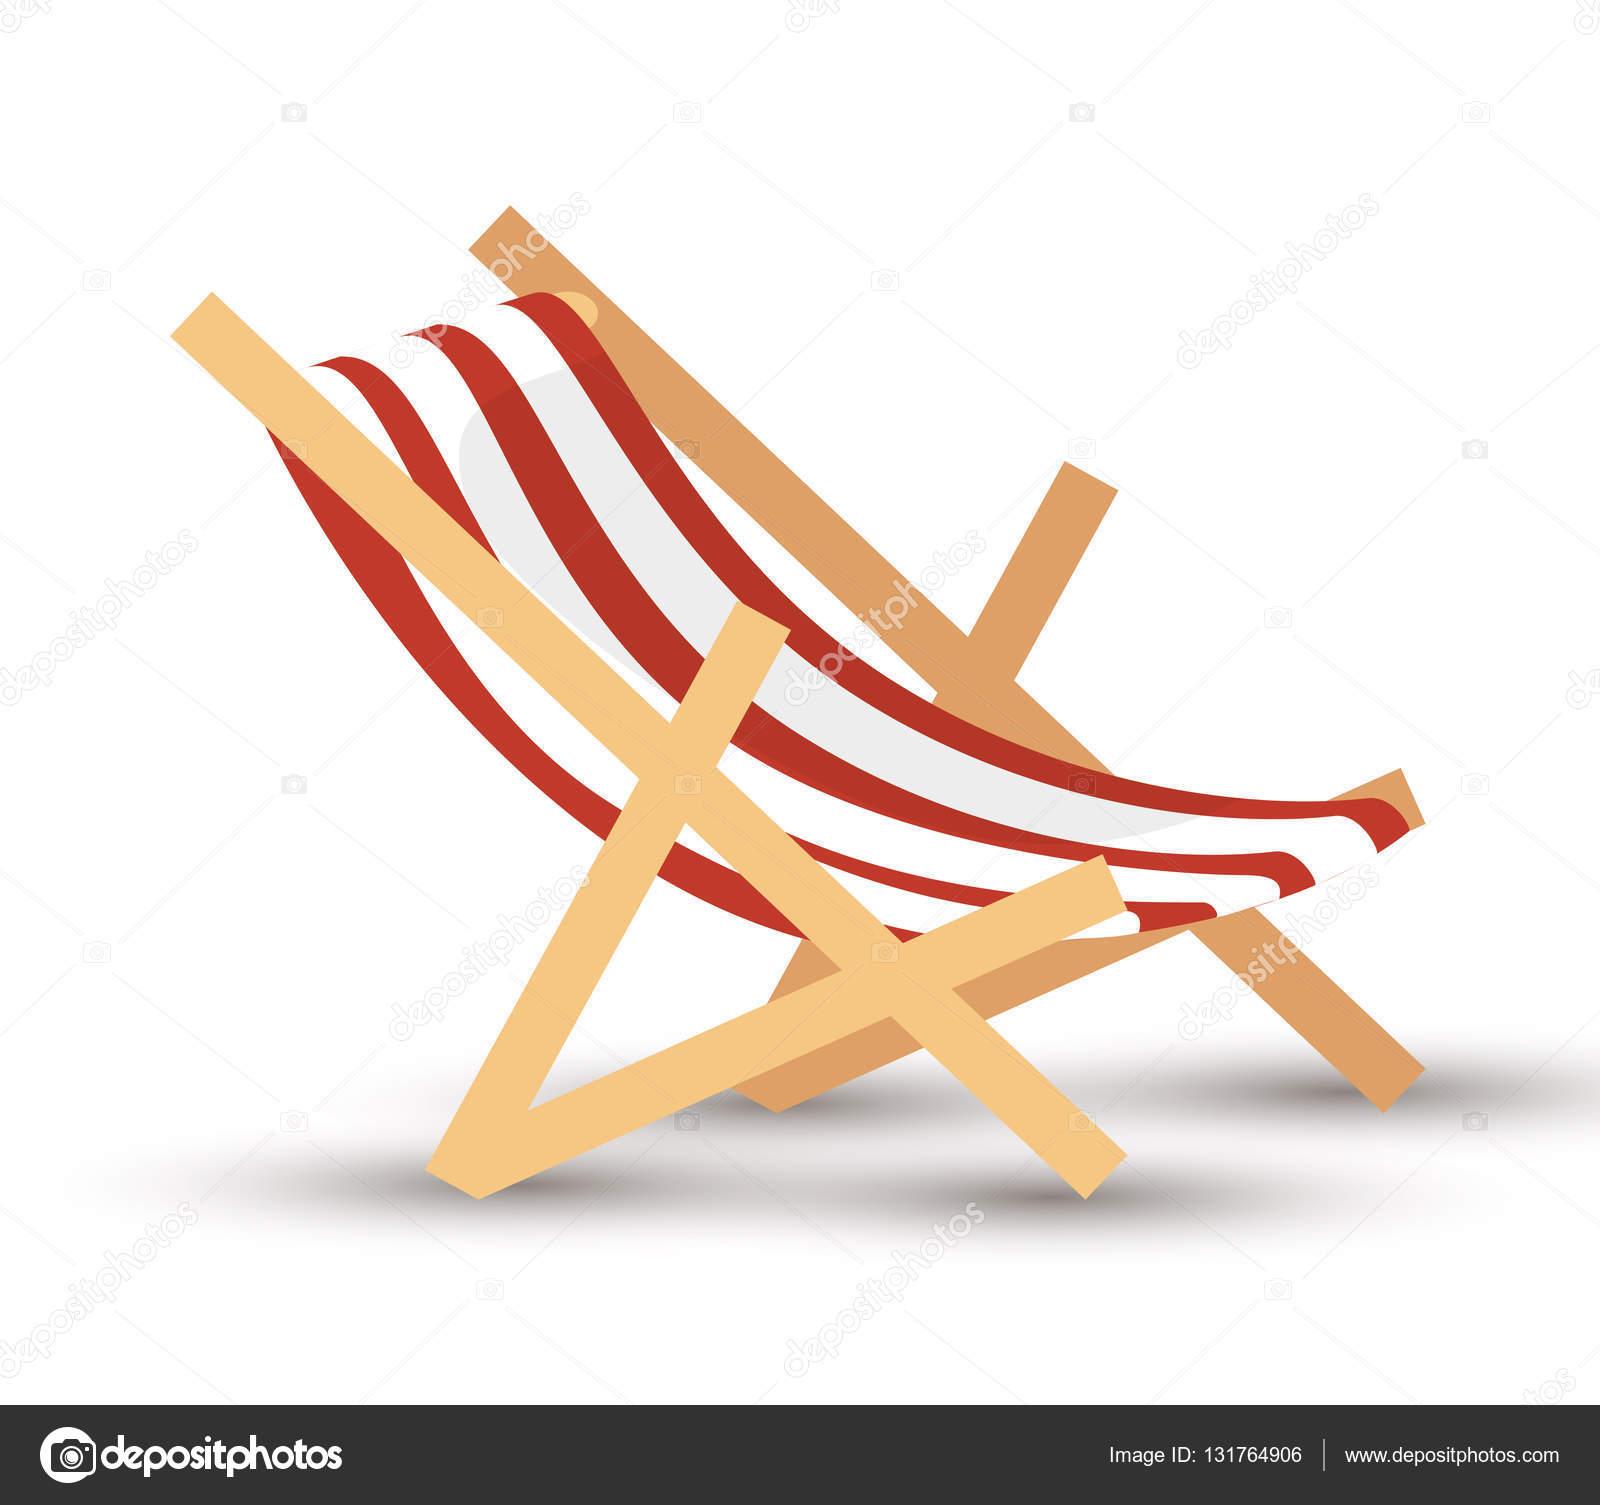 Icono aislado de silla playa vector de stock 131764906 depositphotos - Silla de playa ...